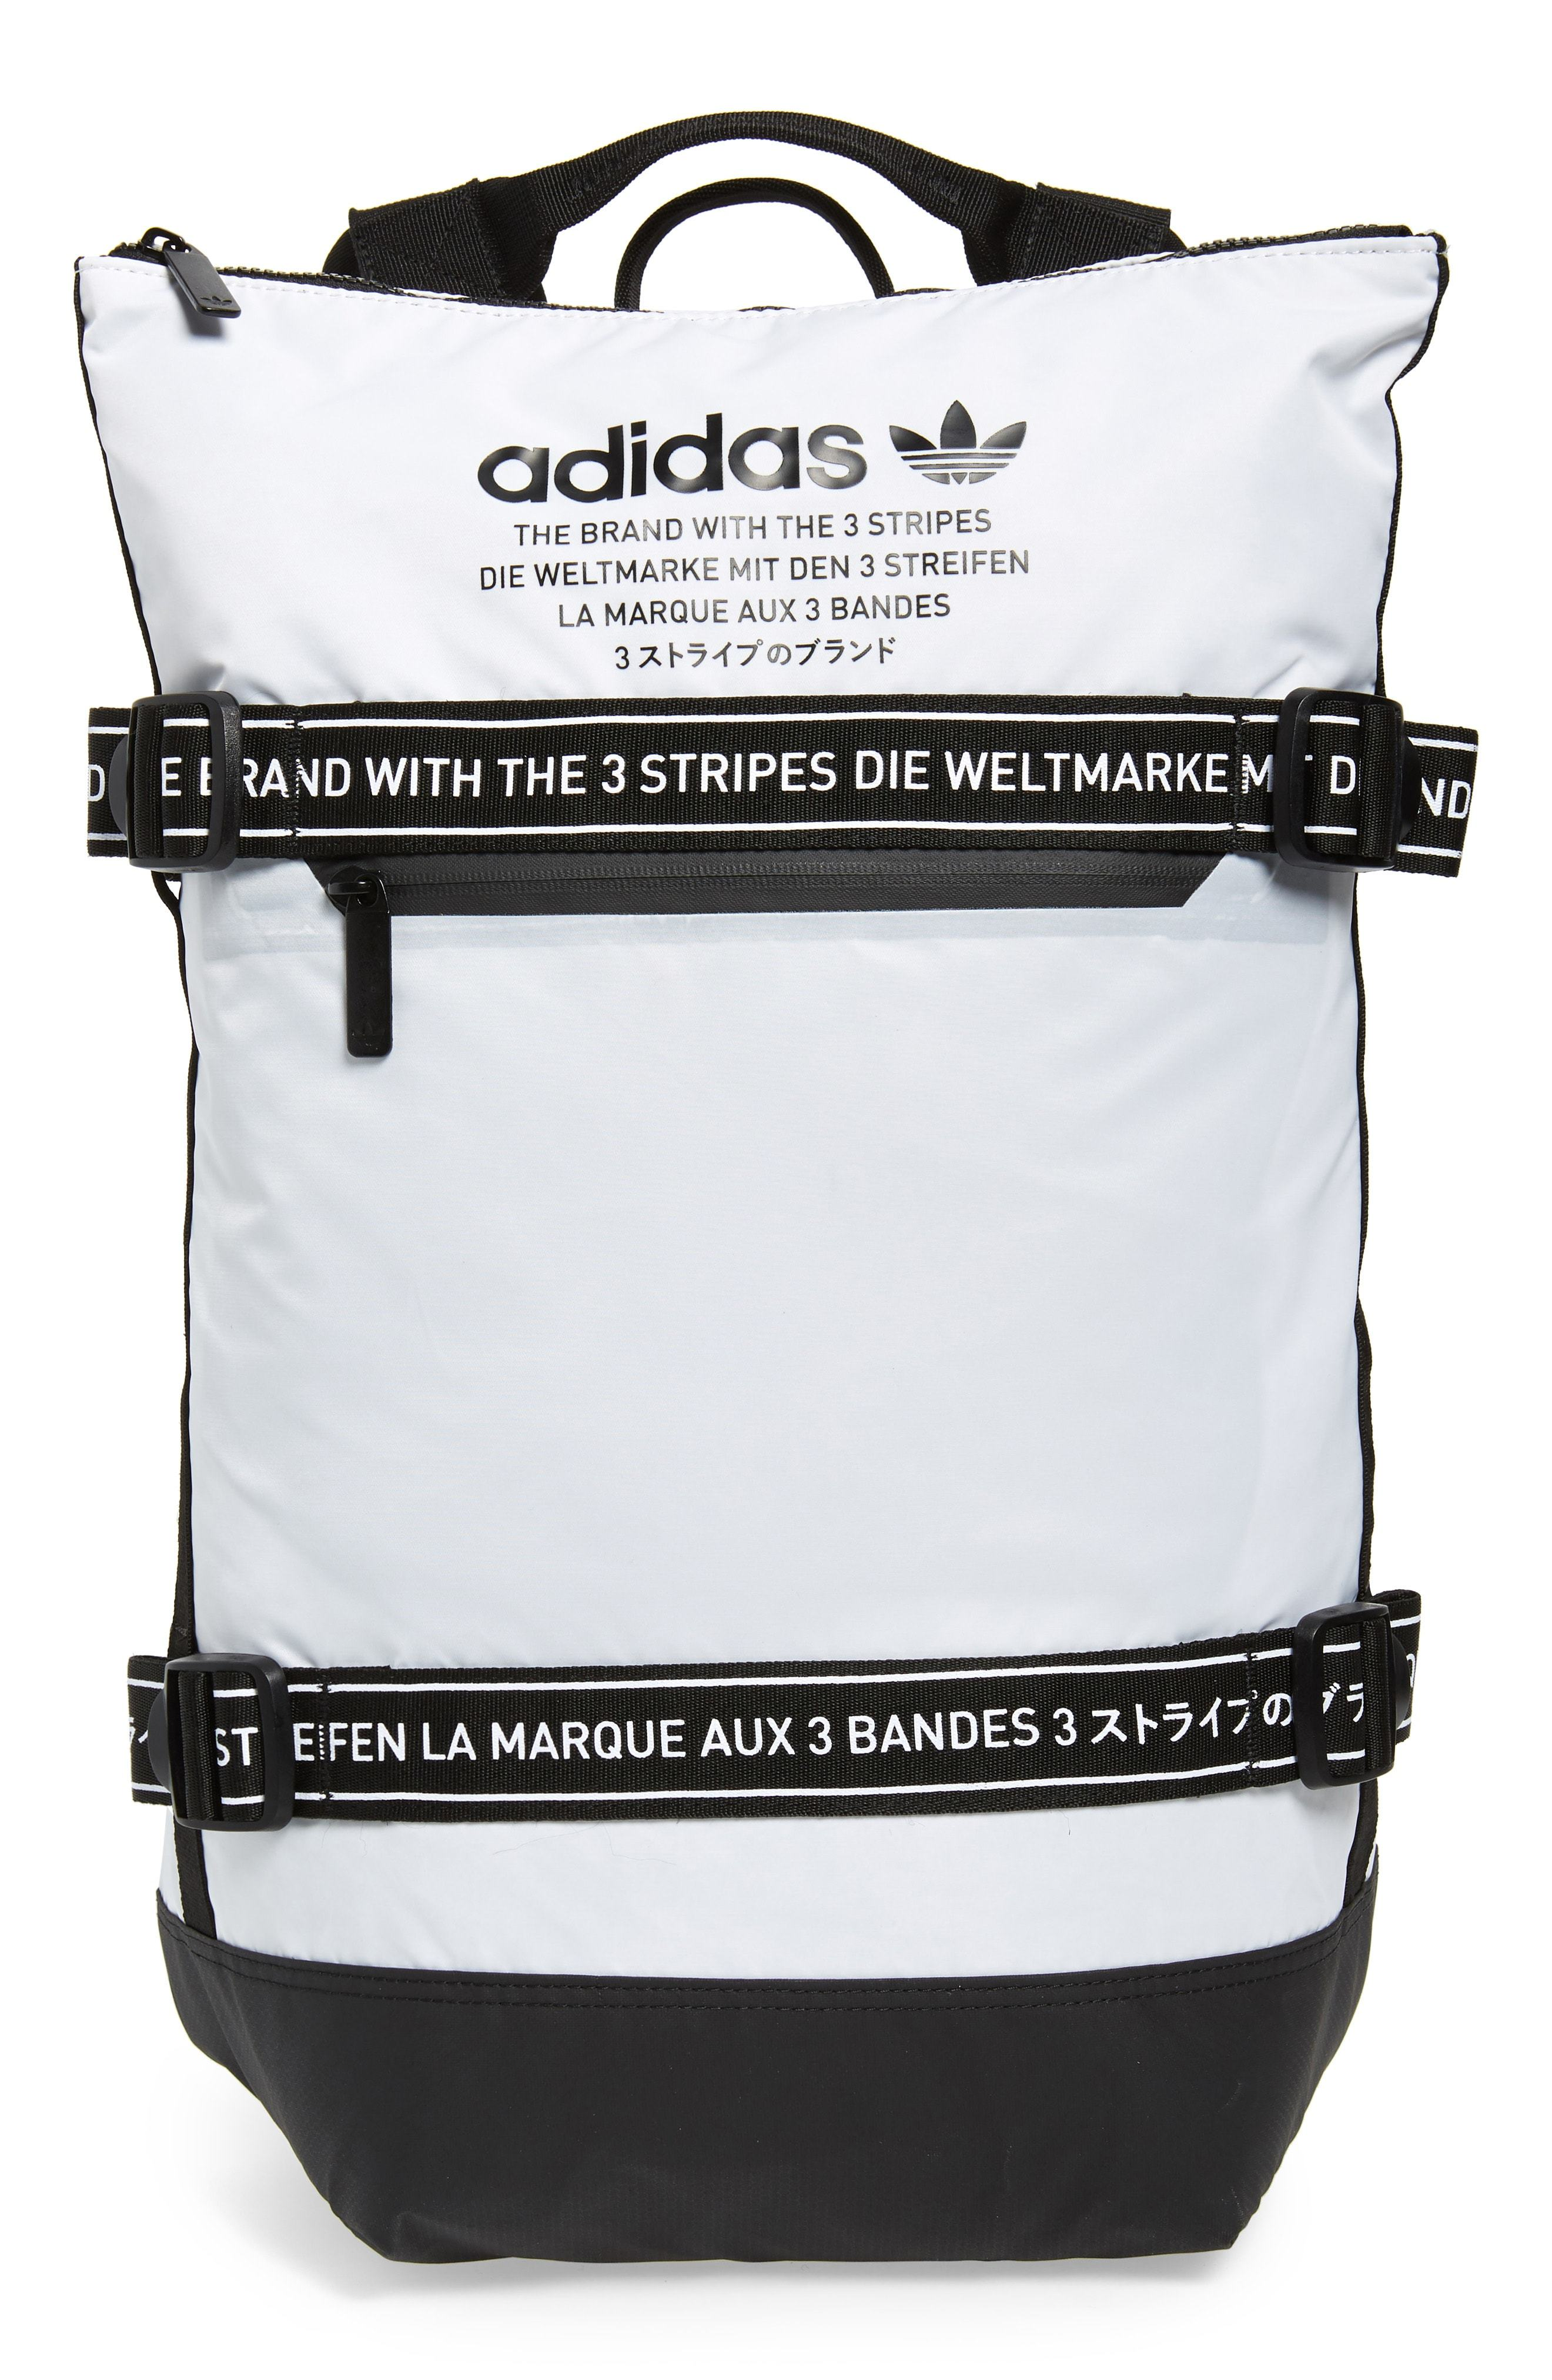 adaaf4f6e0f3 ... adidas Originals Adidas Nmd Backpack